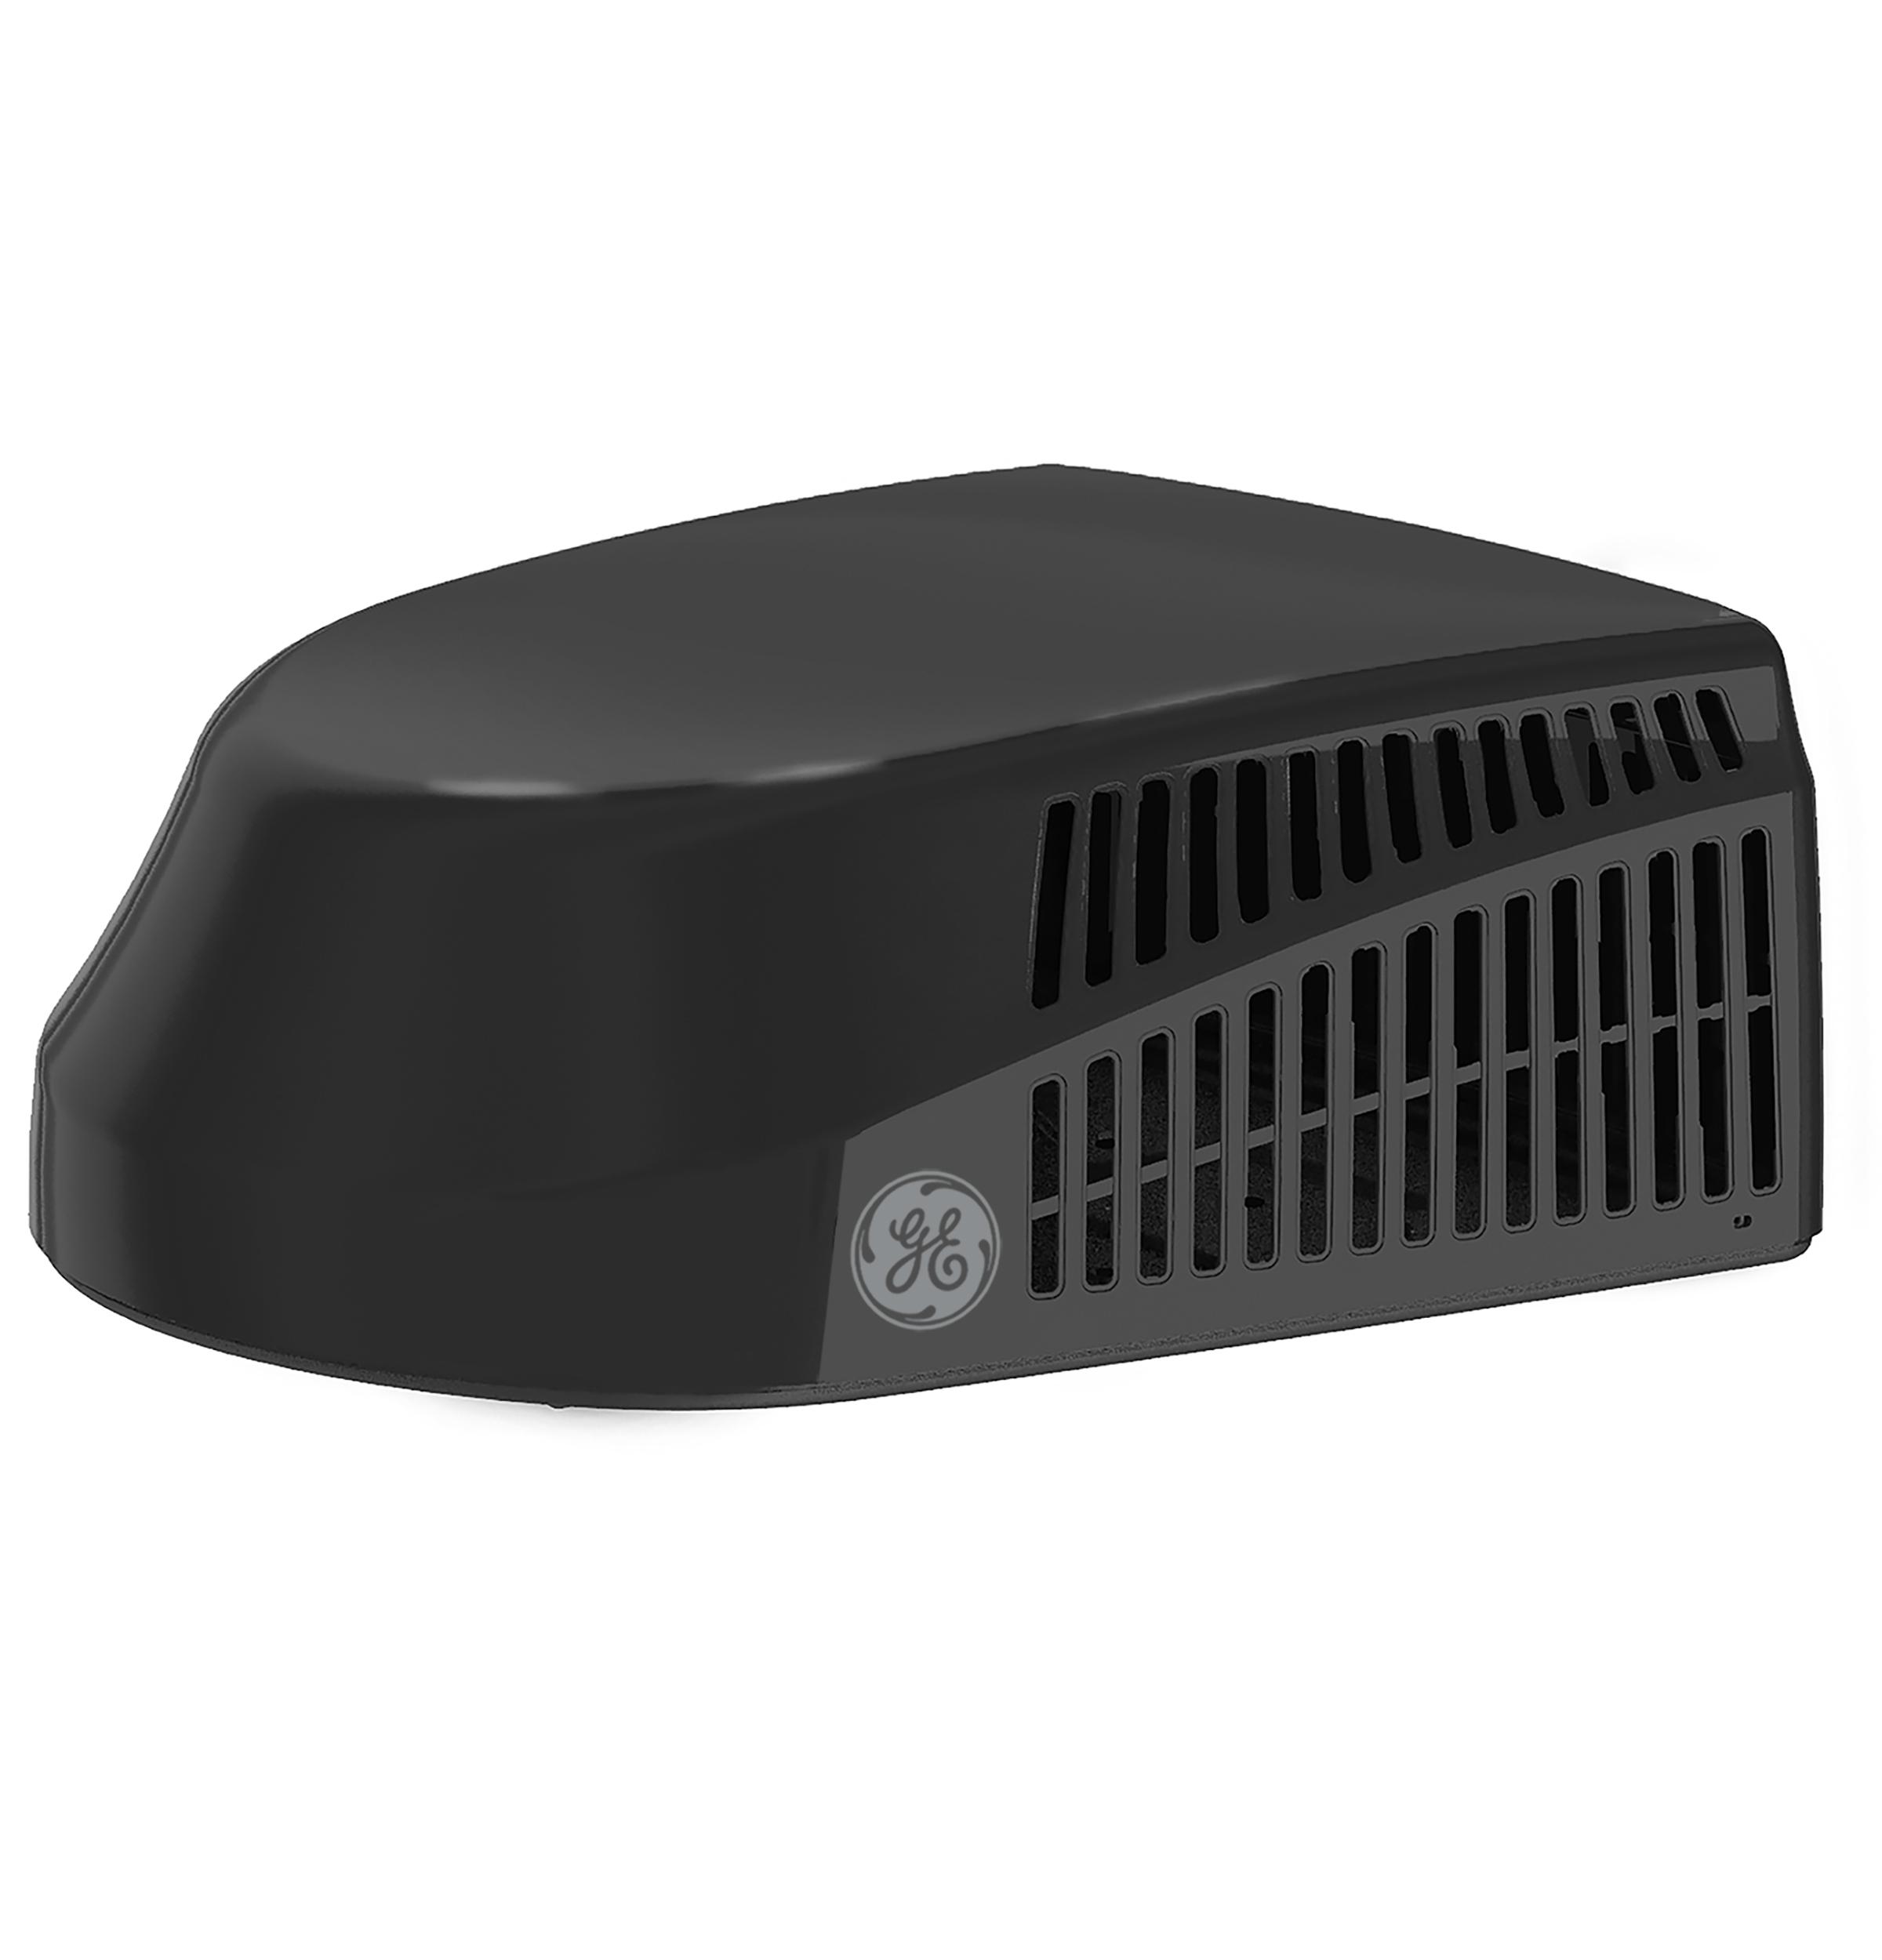 GE Exterior RV Air Conditioner 15k